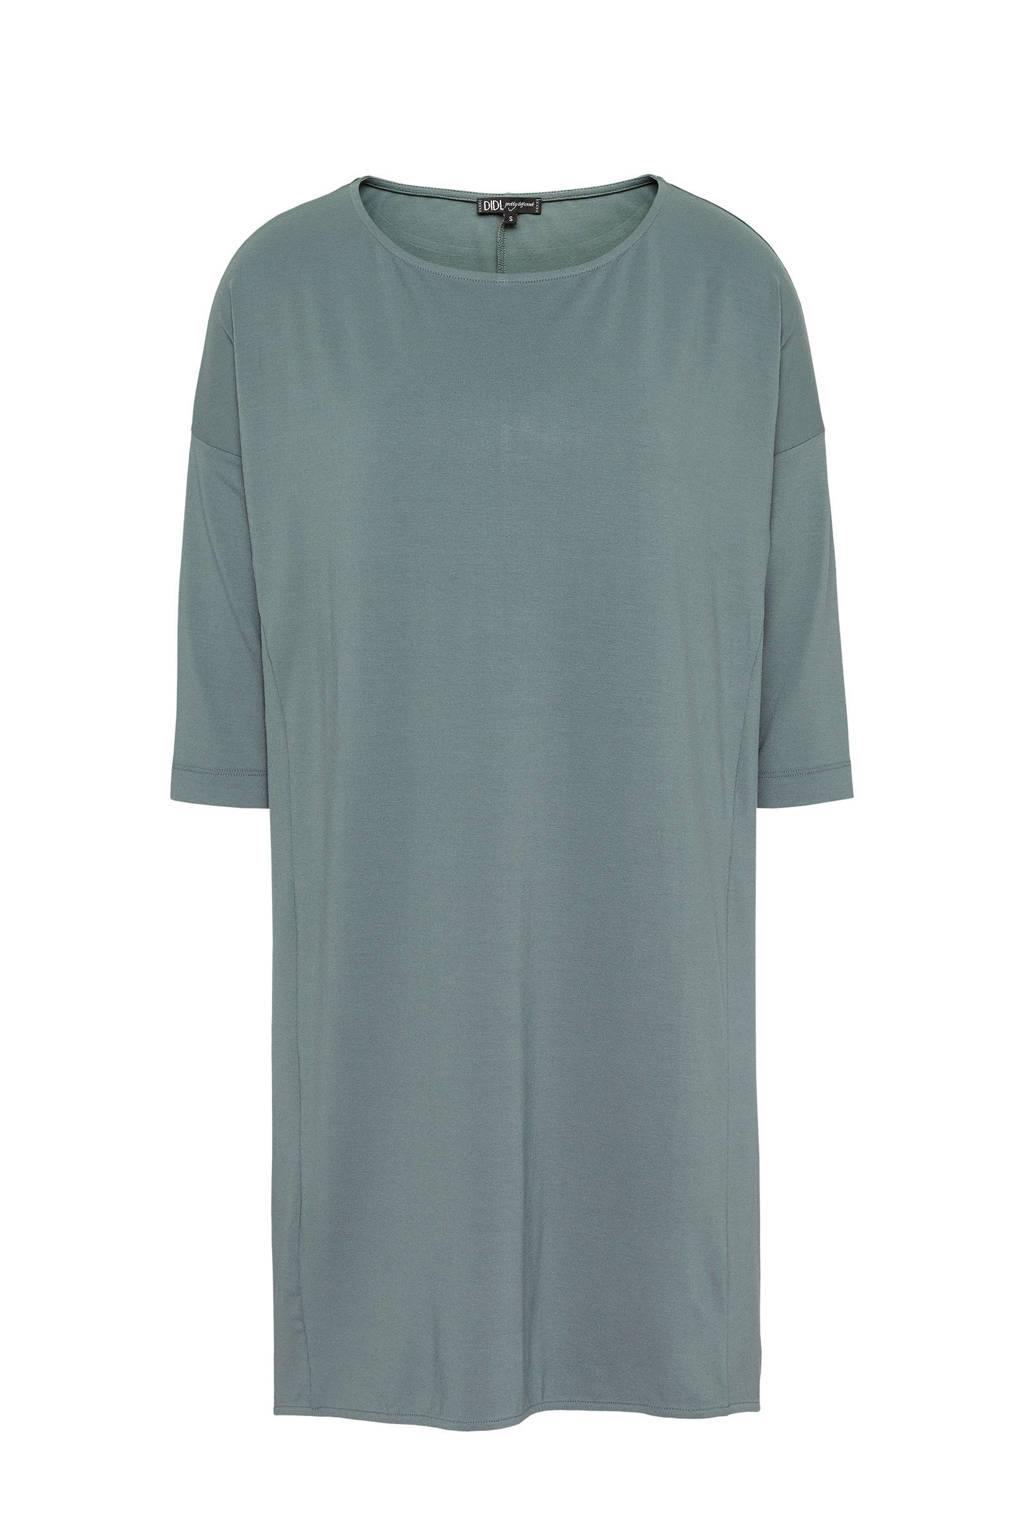 711d445e72e18d Didi basic oversized jurk grijsblauw